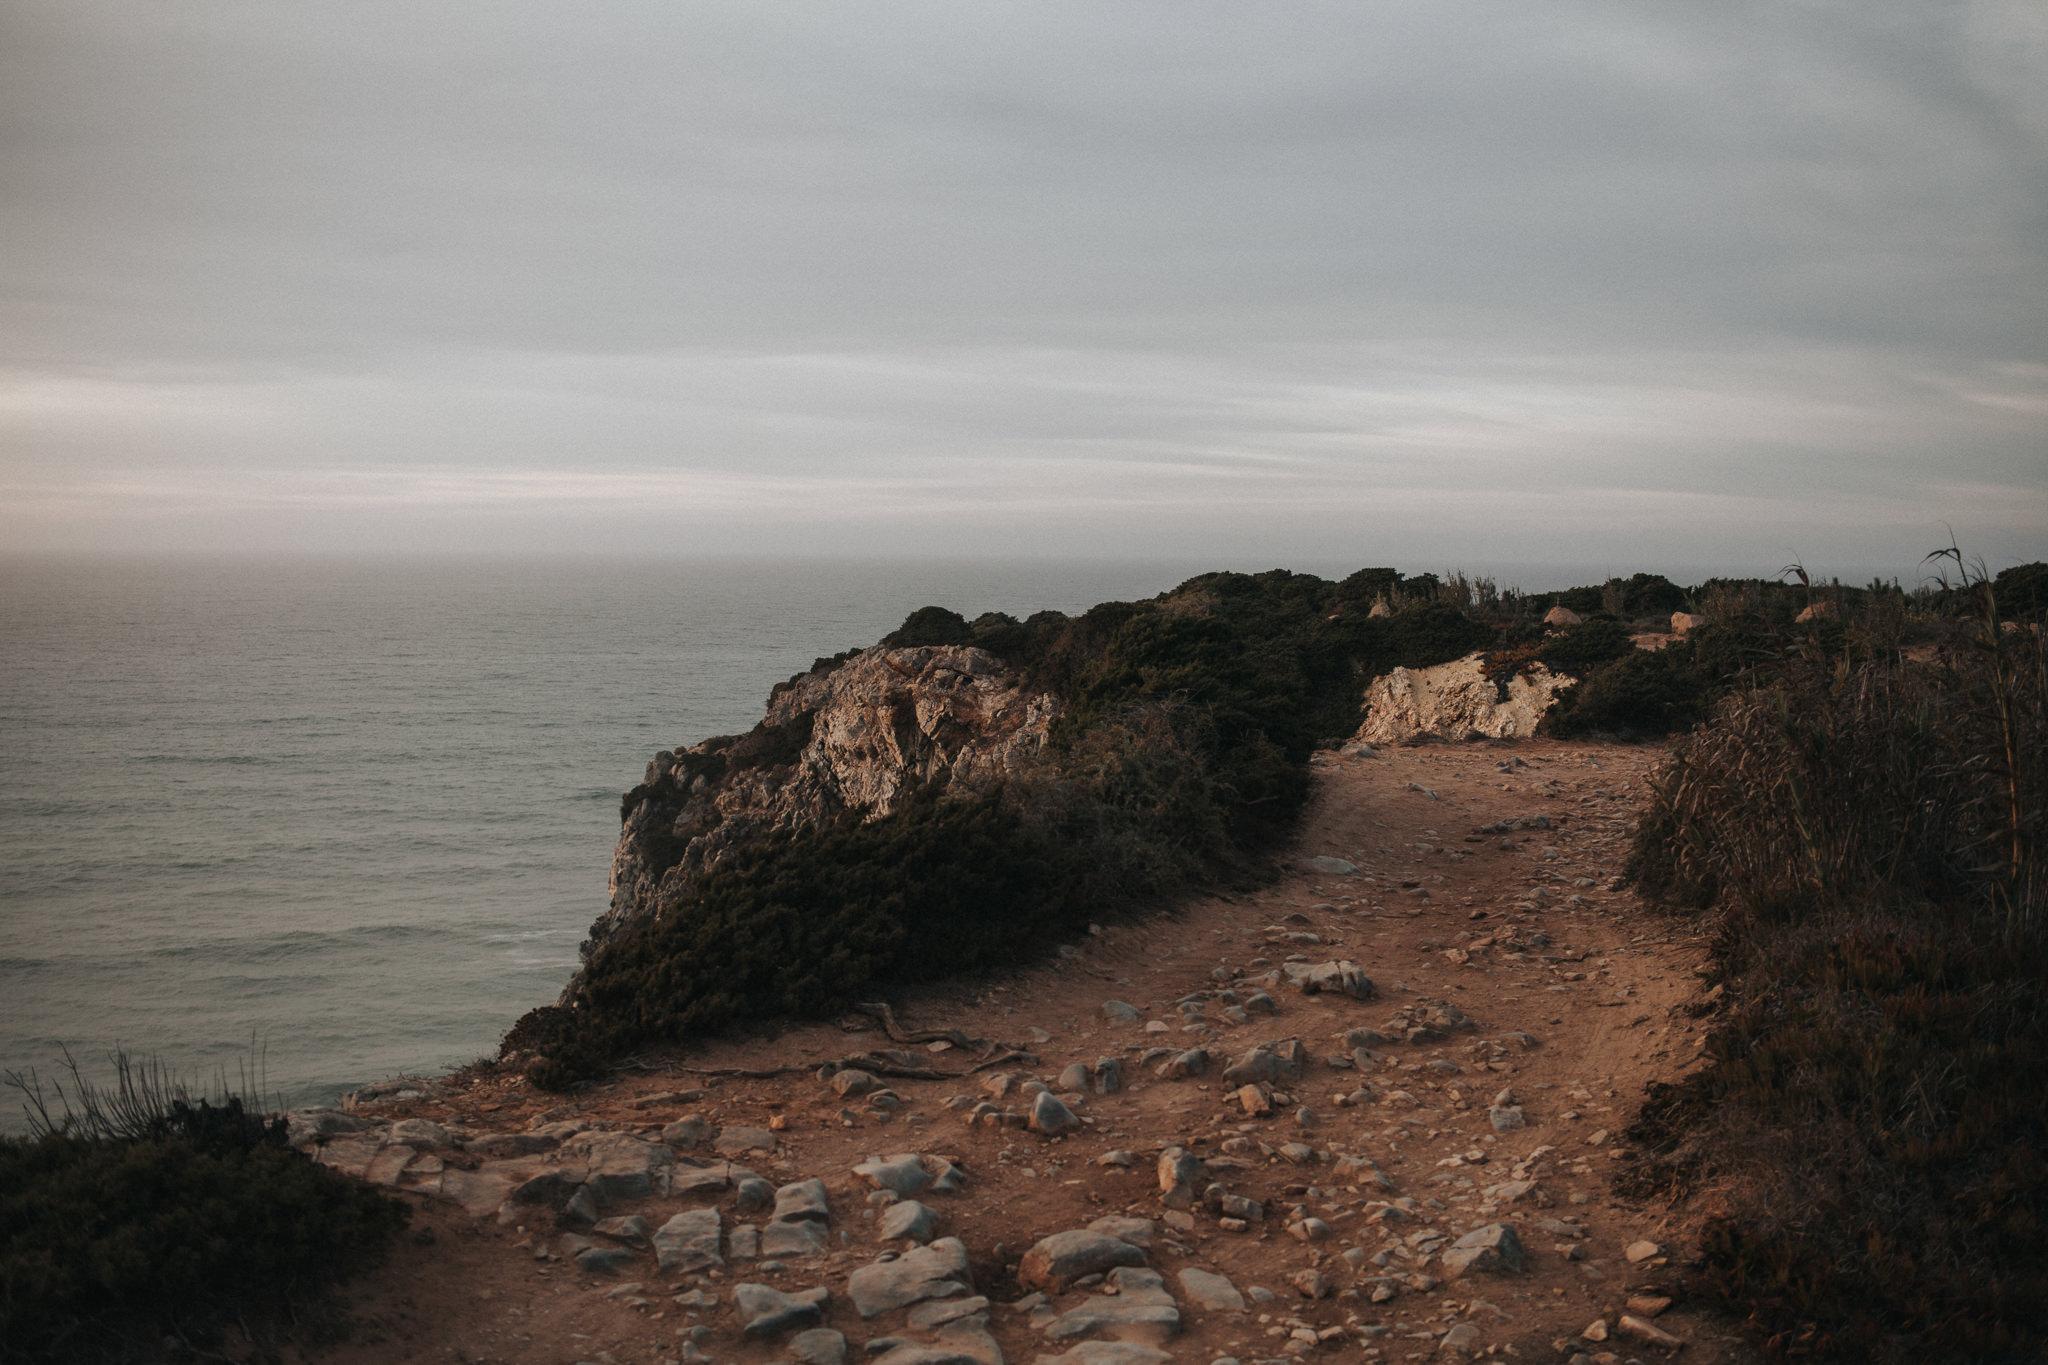 Coast line by sunset